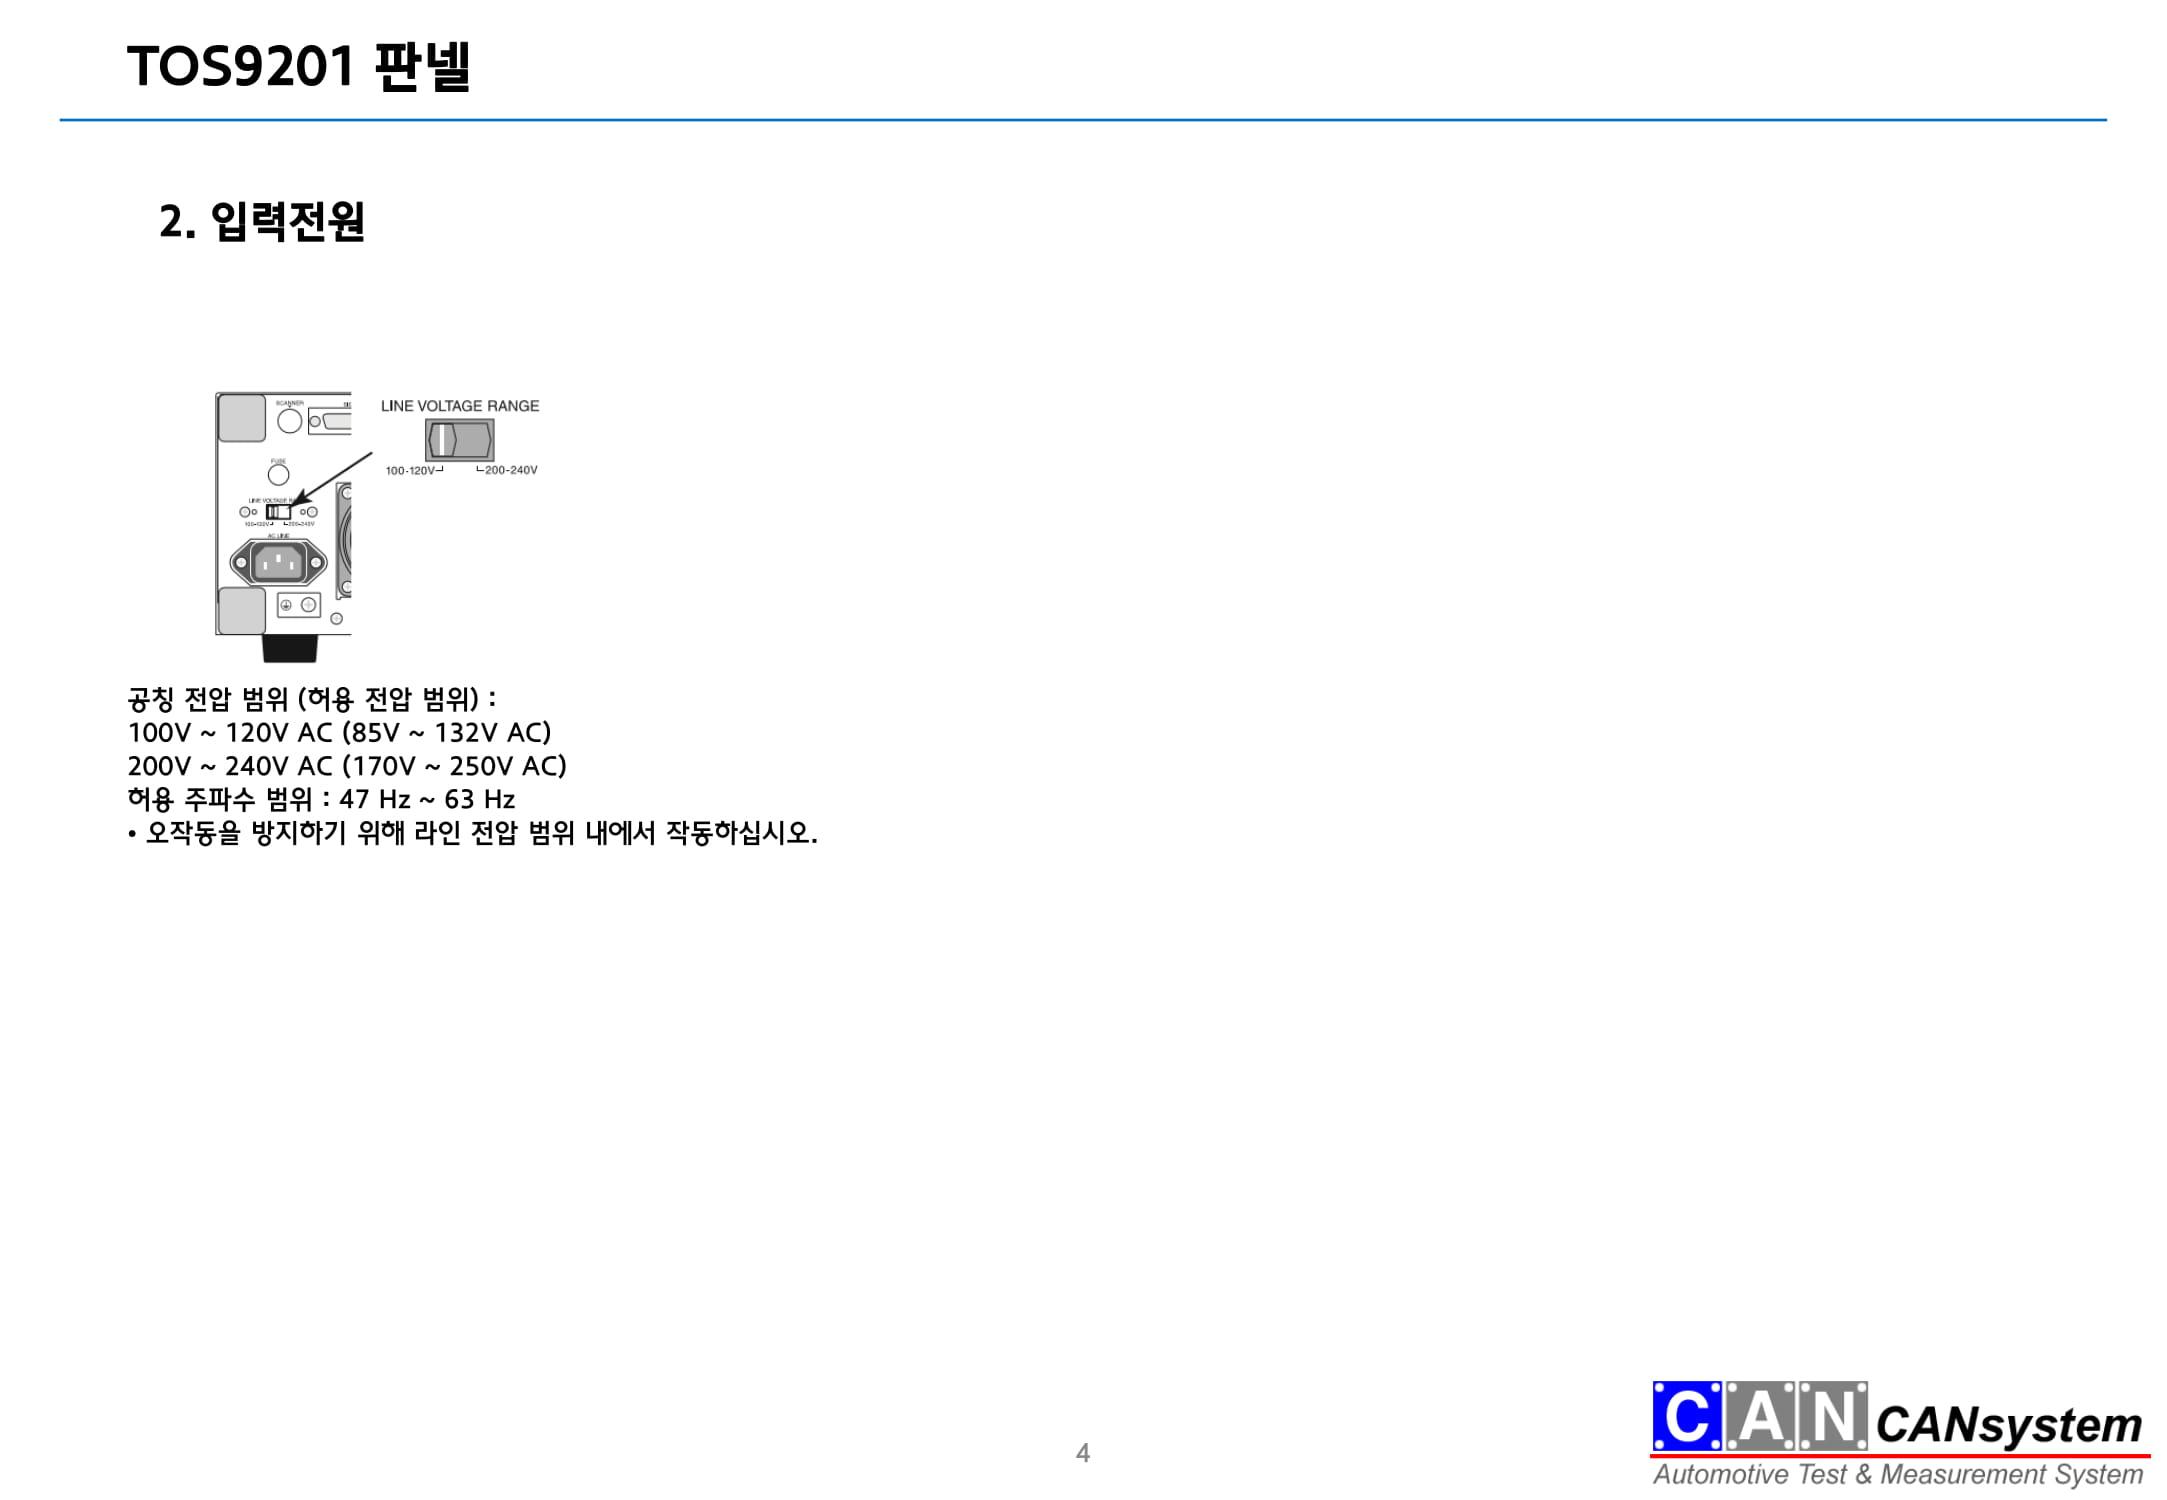 KIKUSUI TOS9201 국문 이용가이드-04.jpg